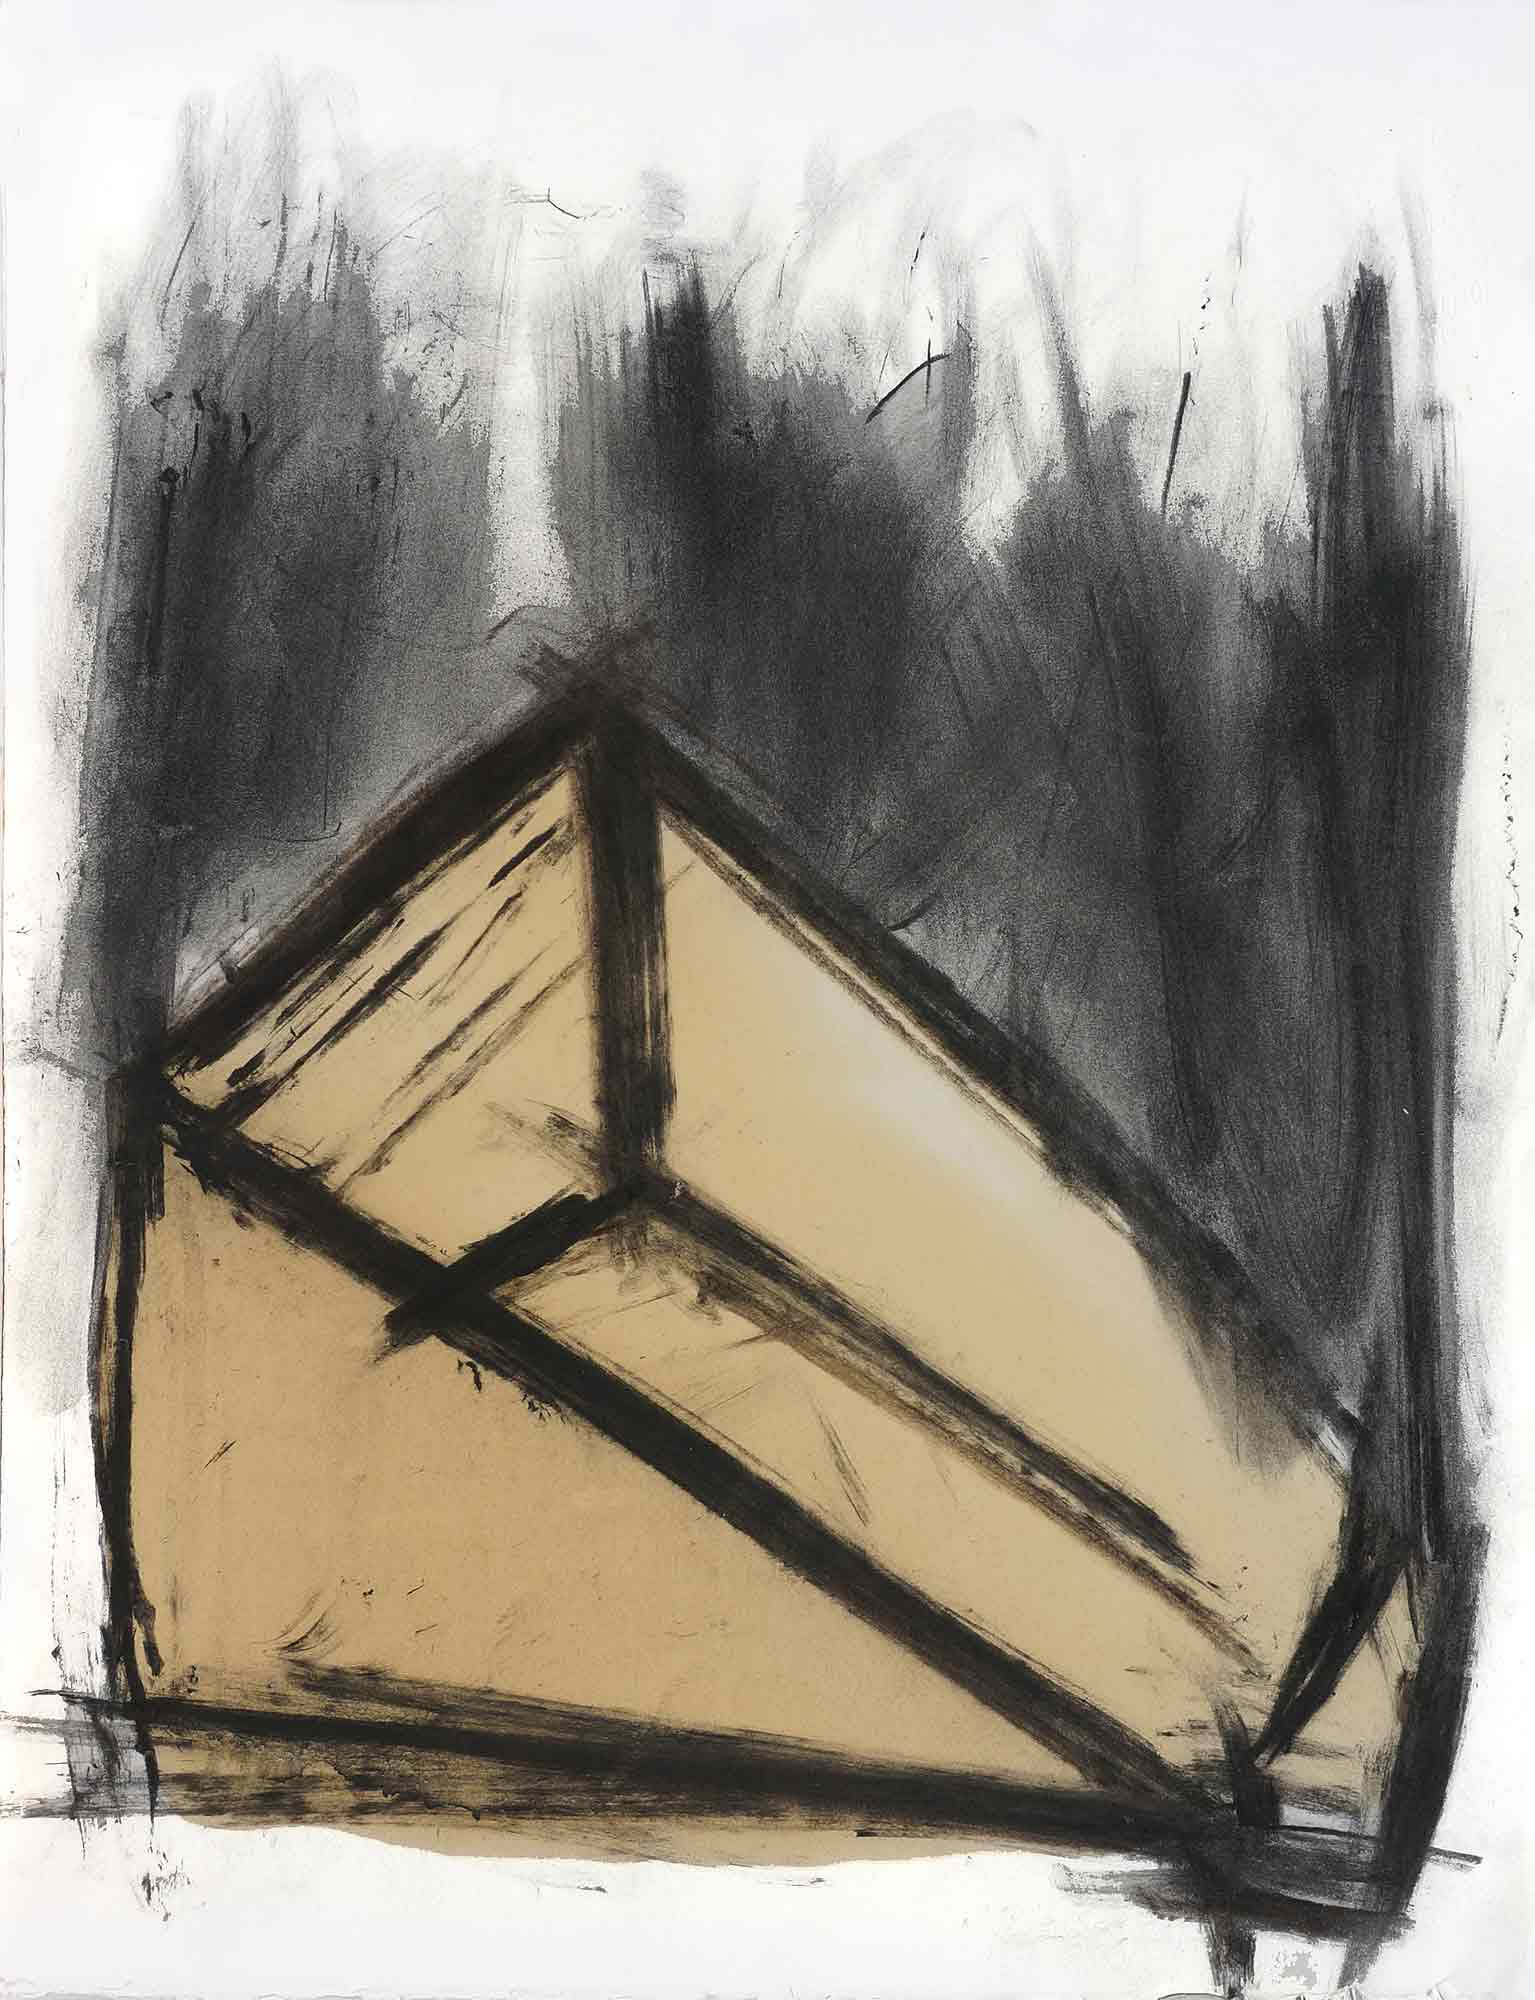 Mangeoire - 1987 – Fusain, gomme laque. 65 x 50 cm. Denis Falgoux.